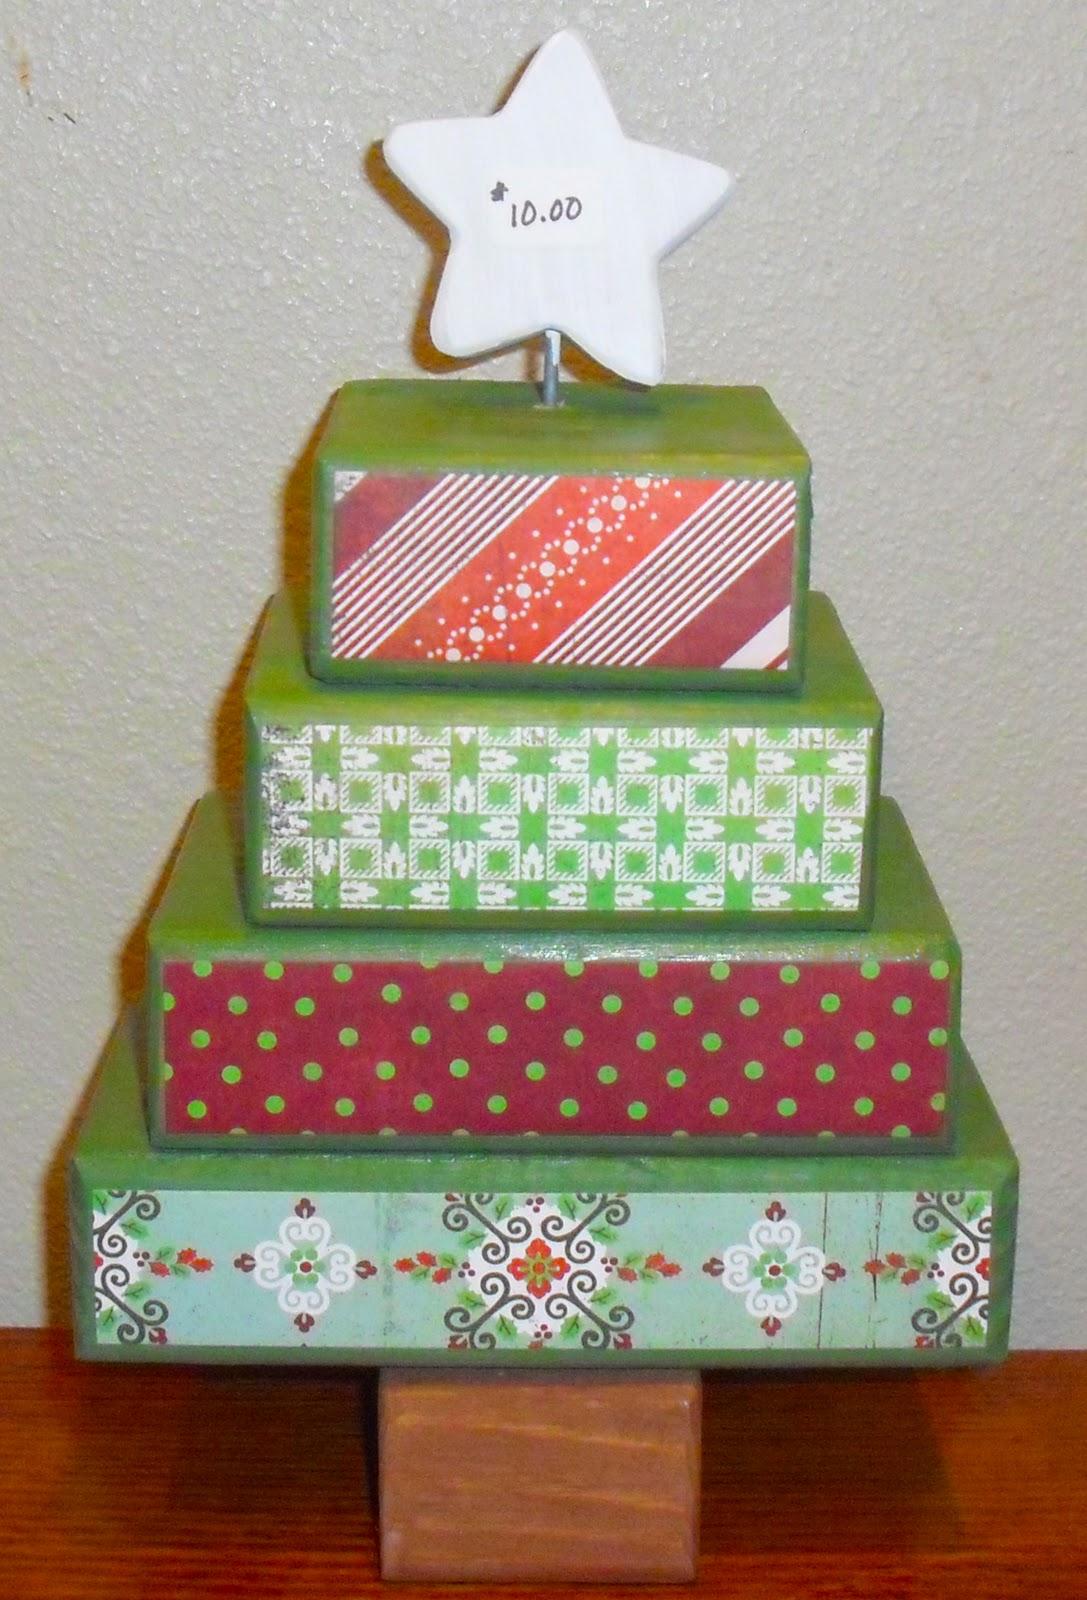 Polka dot door creations christmas crafts 2011 for Christmas crafts using wood